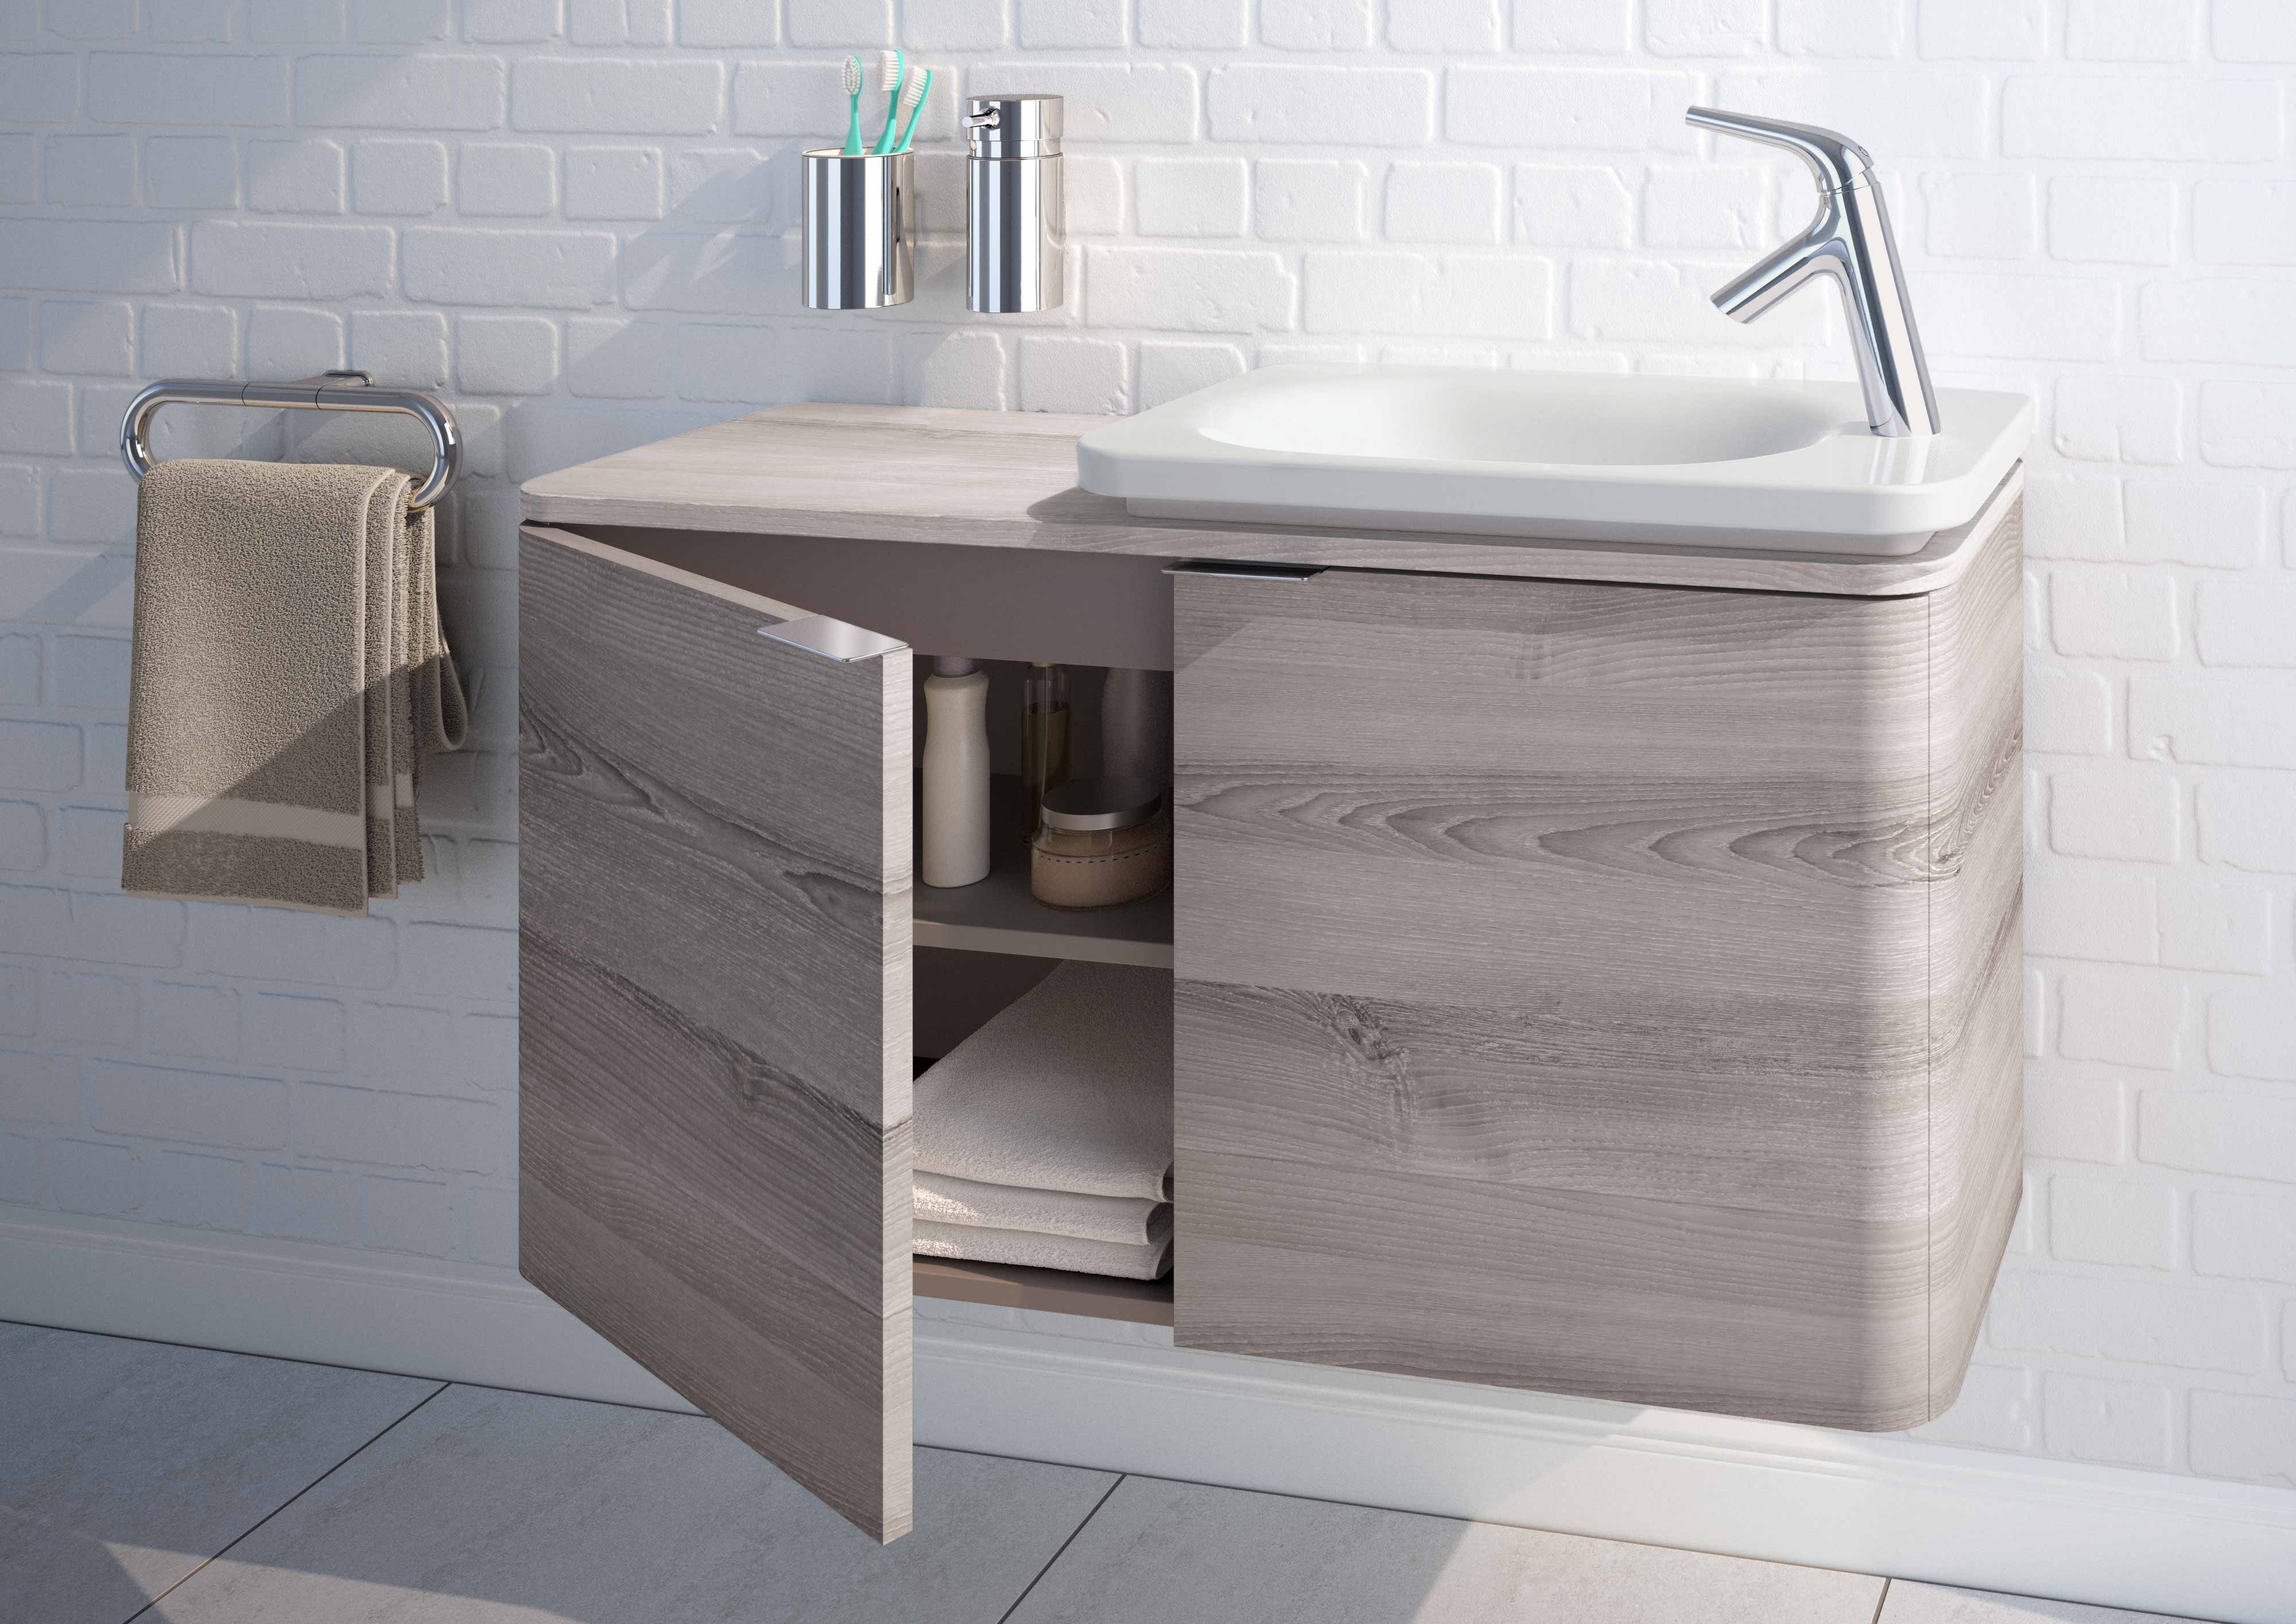 Square Water Jewels Basin Designed By Matteo Thun For VitrA VitrA  Www.vitra.co.uk Featured In Designer Kitchen U0026 Bathroom Magazine June 2014  #Desiu2026